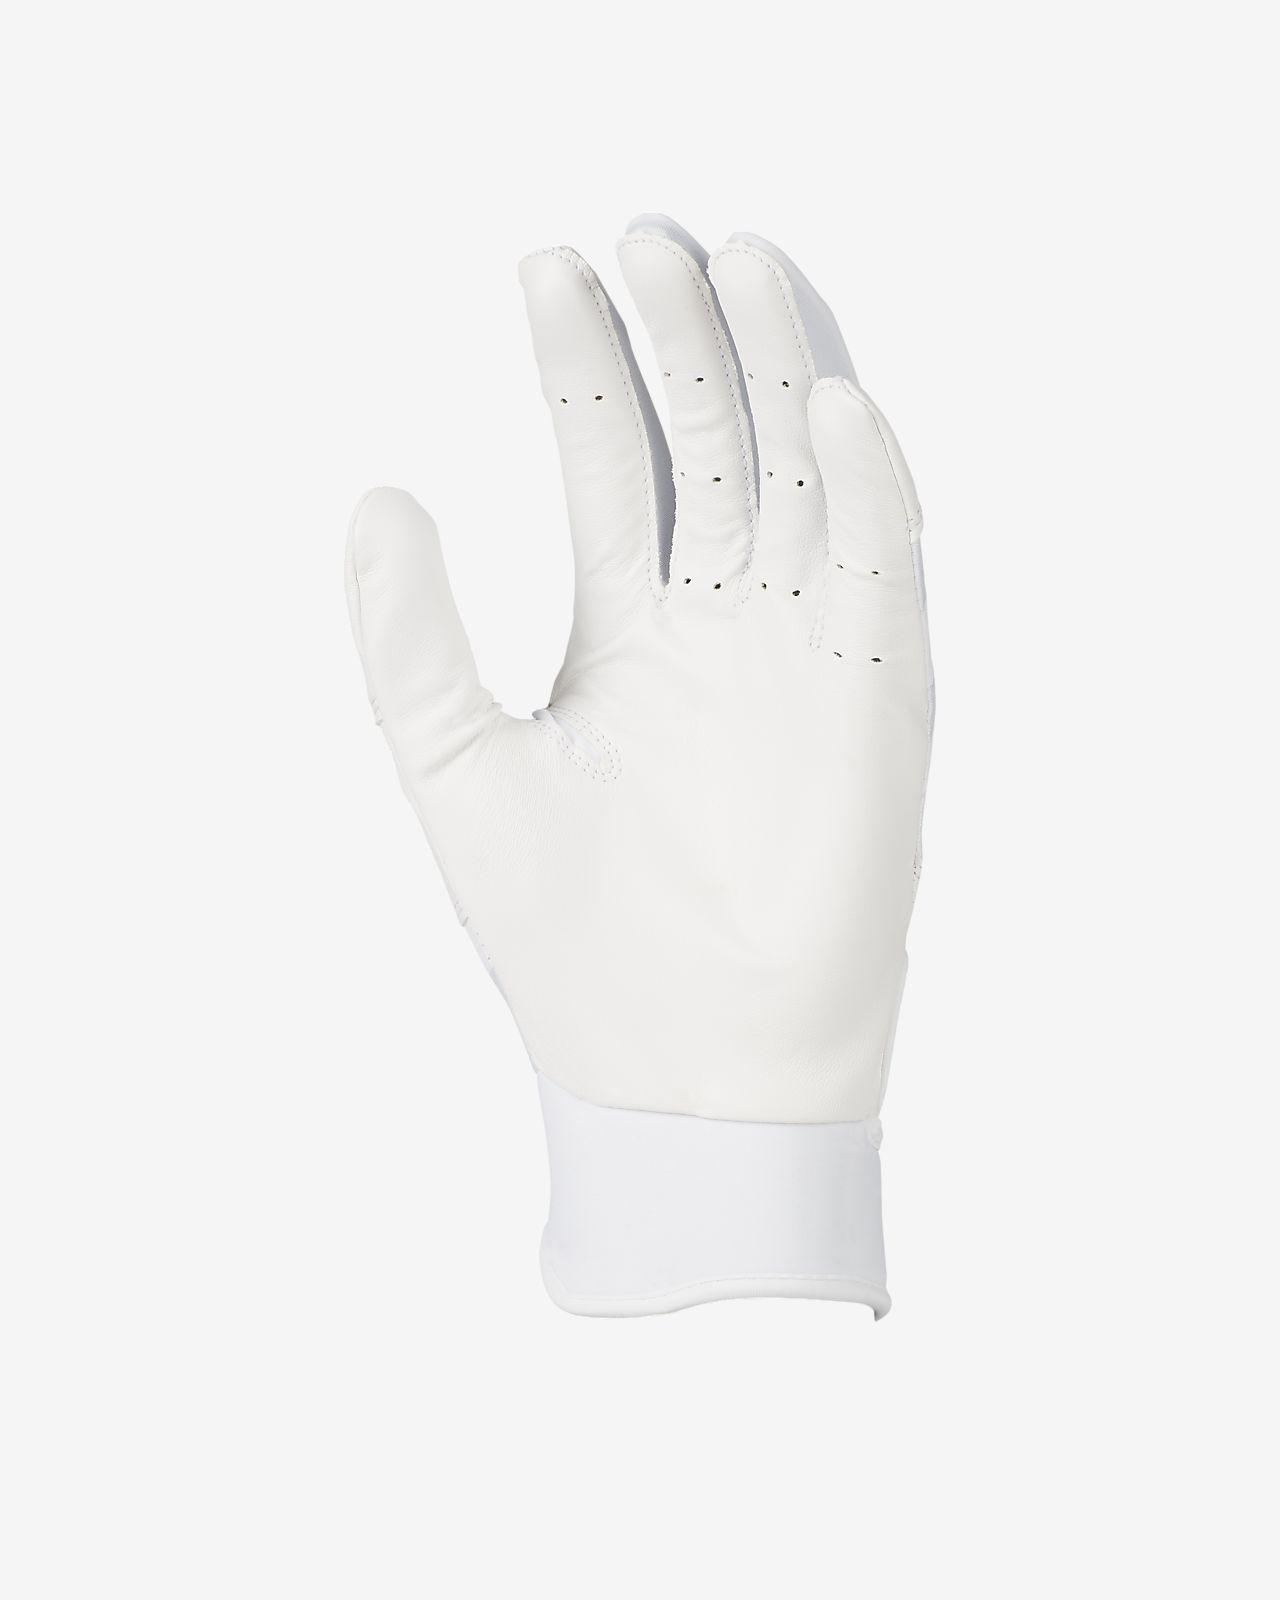 Nike Adult Huarache Edge Baseball Batting Glove Hibbett US